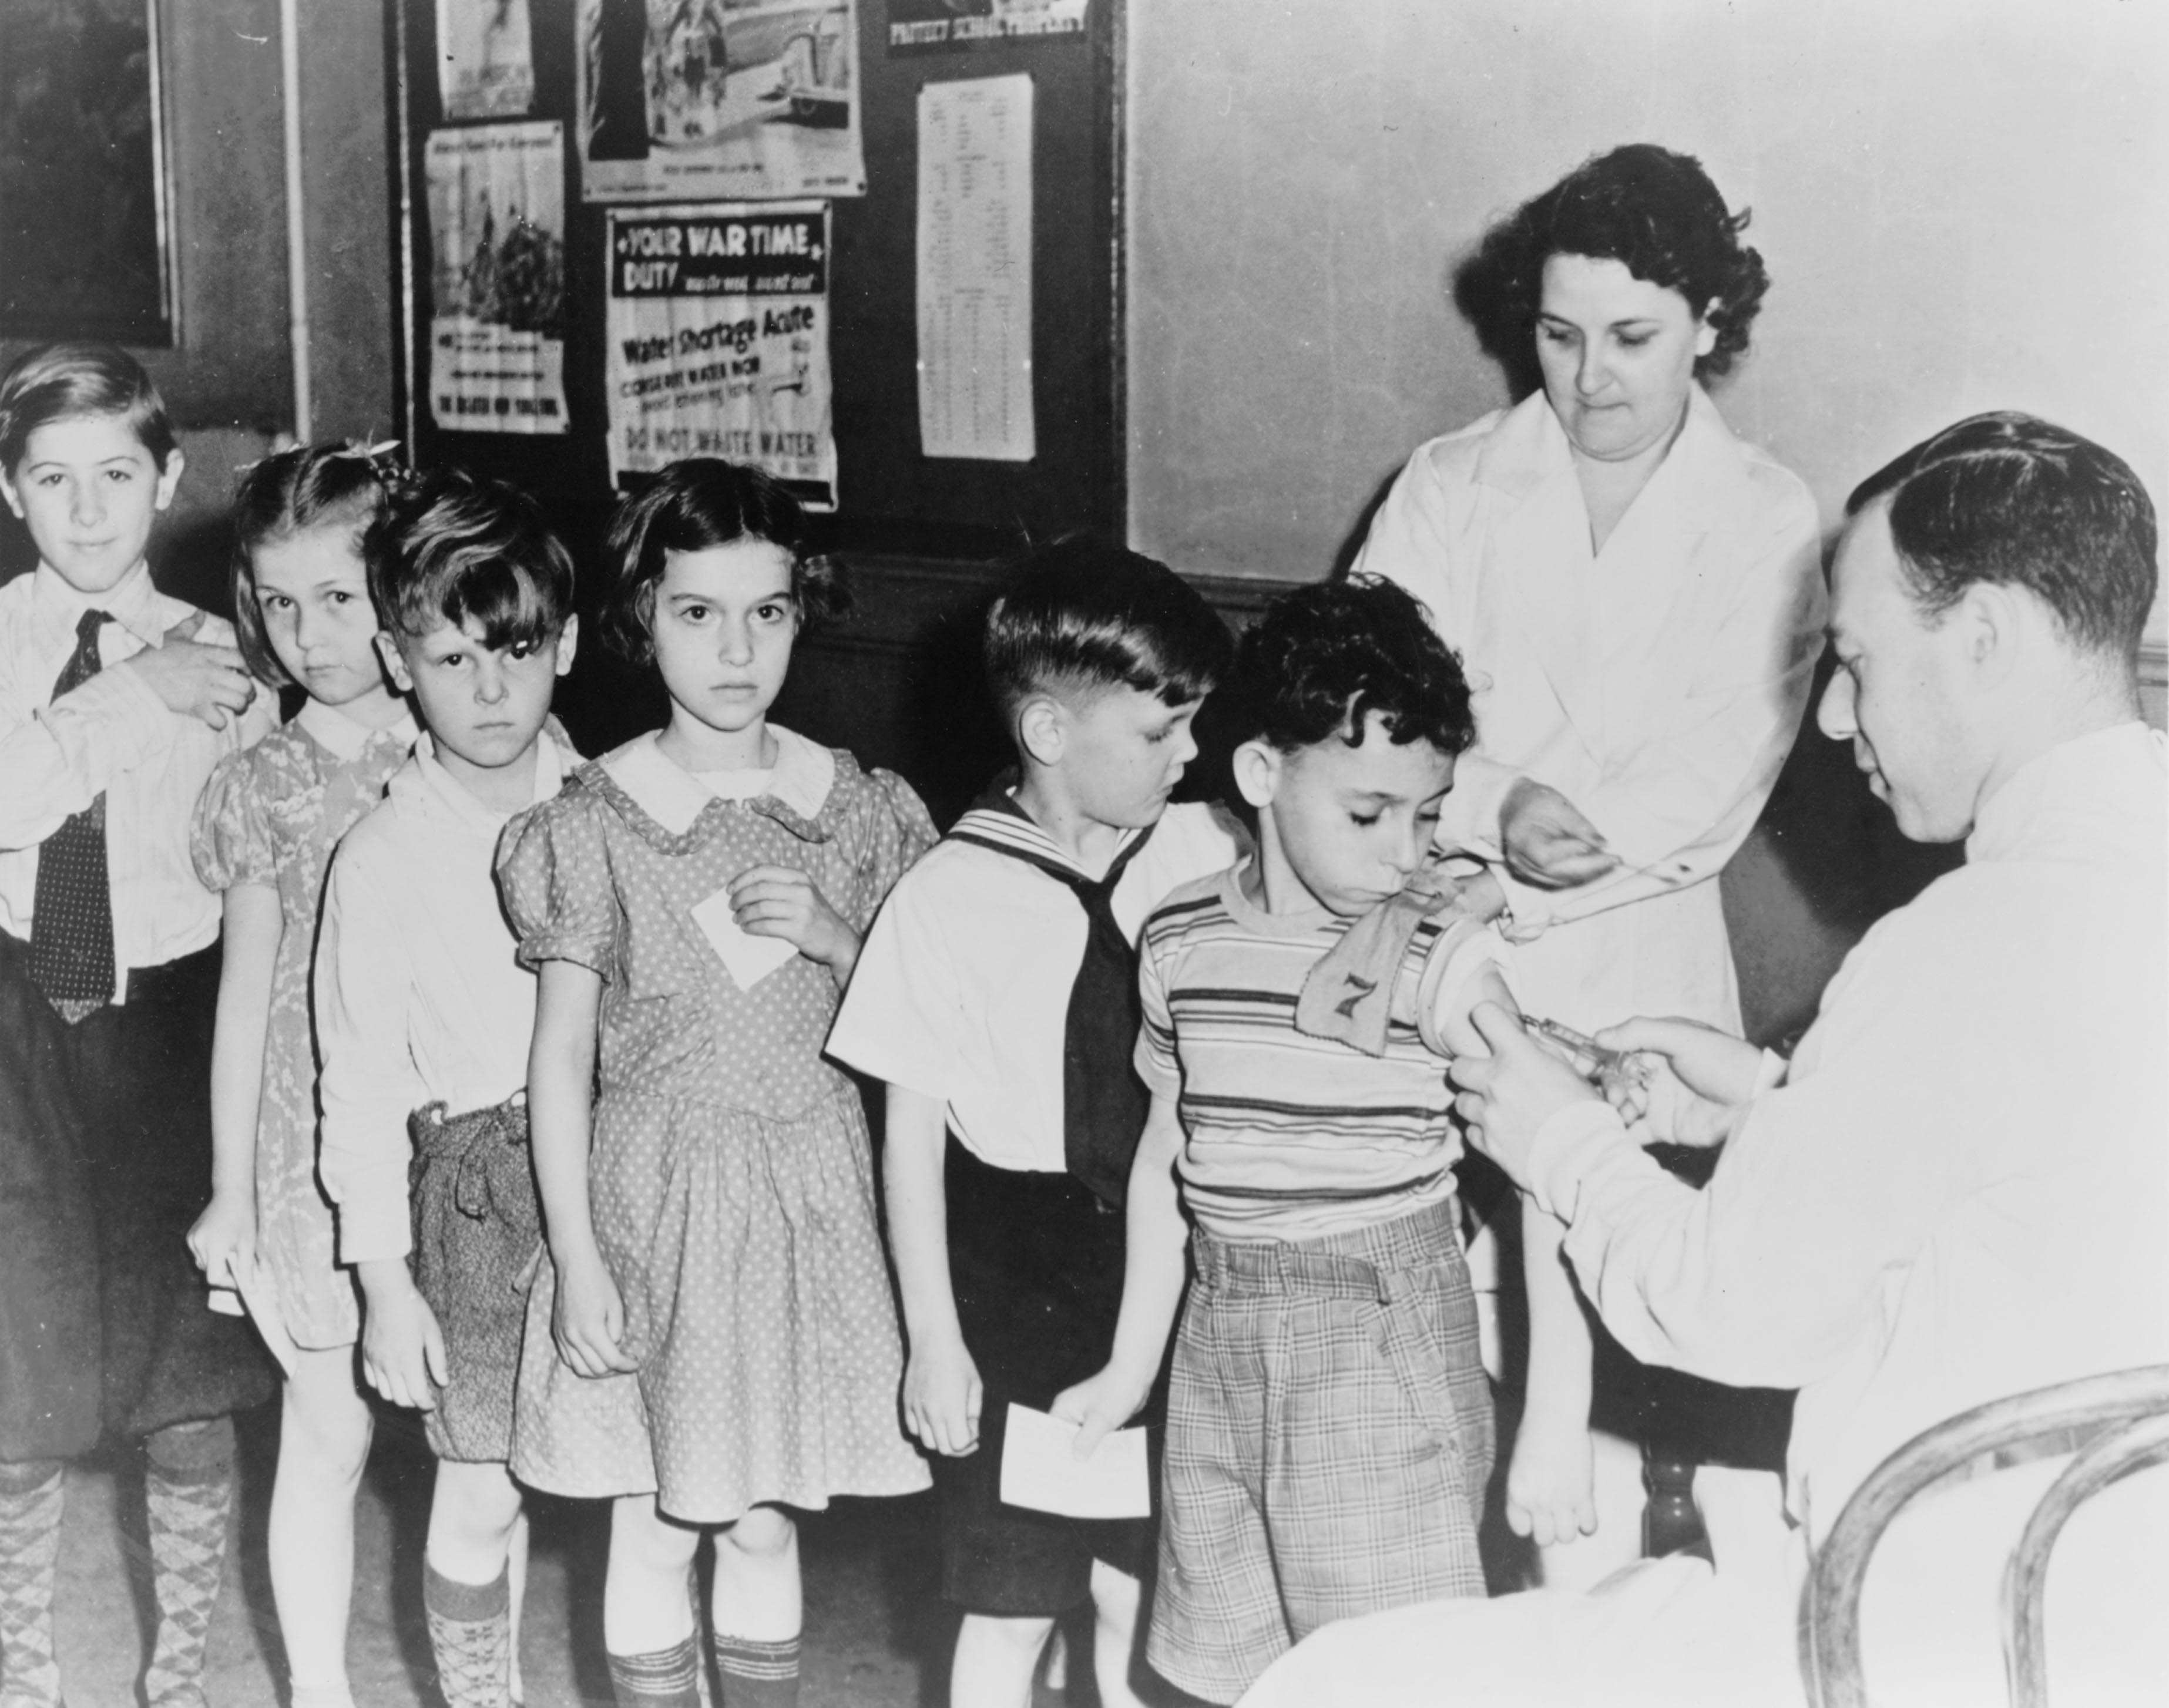 polio an american story by david Polio: an american story (david m oshinsky) (2006) isbn: 9780195307146 - , satisfaction 100% guaranteed paperback - bücher online finden vergleichen kaufen .